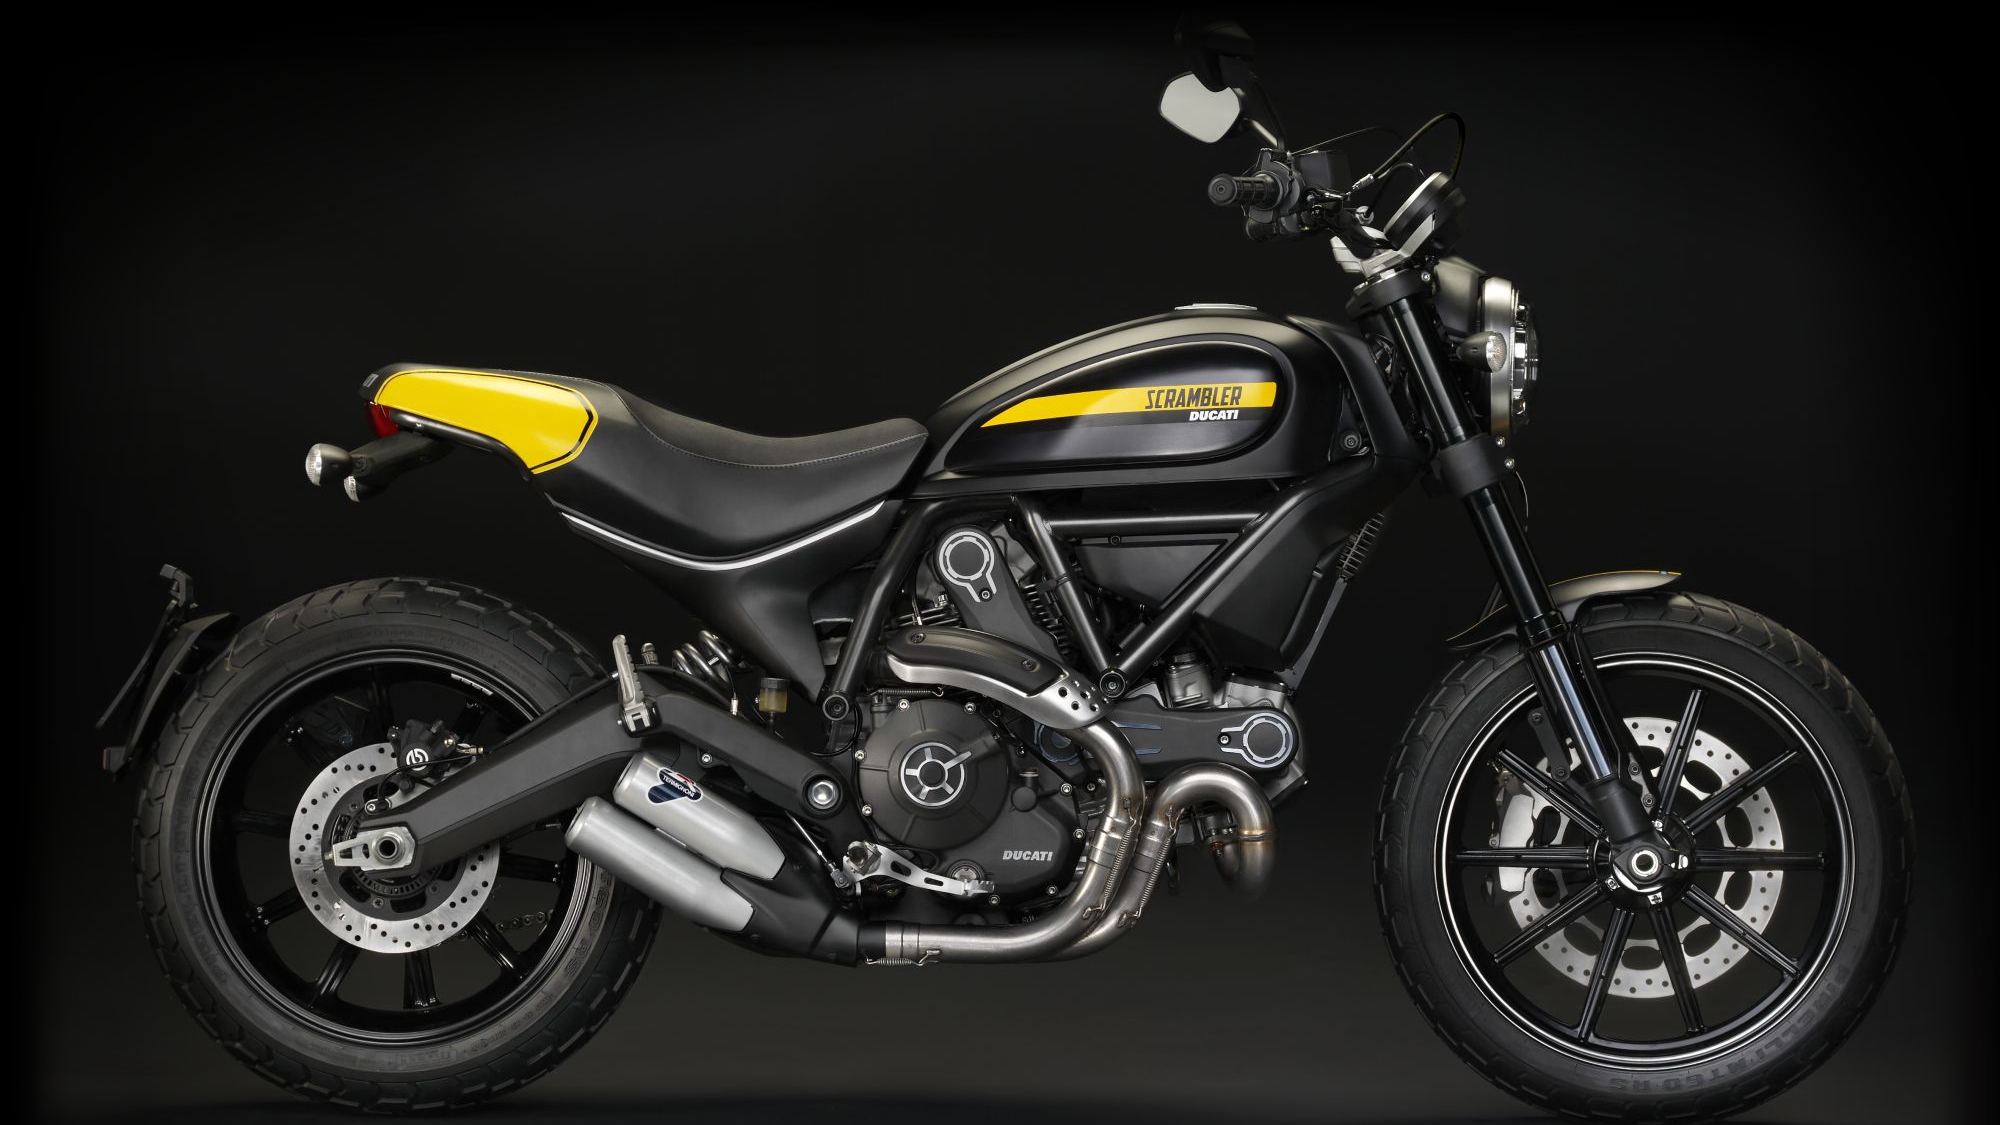 мотоцикл Ducati Scrambler Full Throttle мотоарт купить